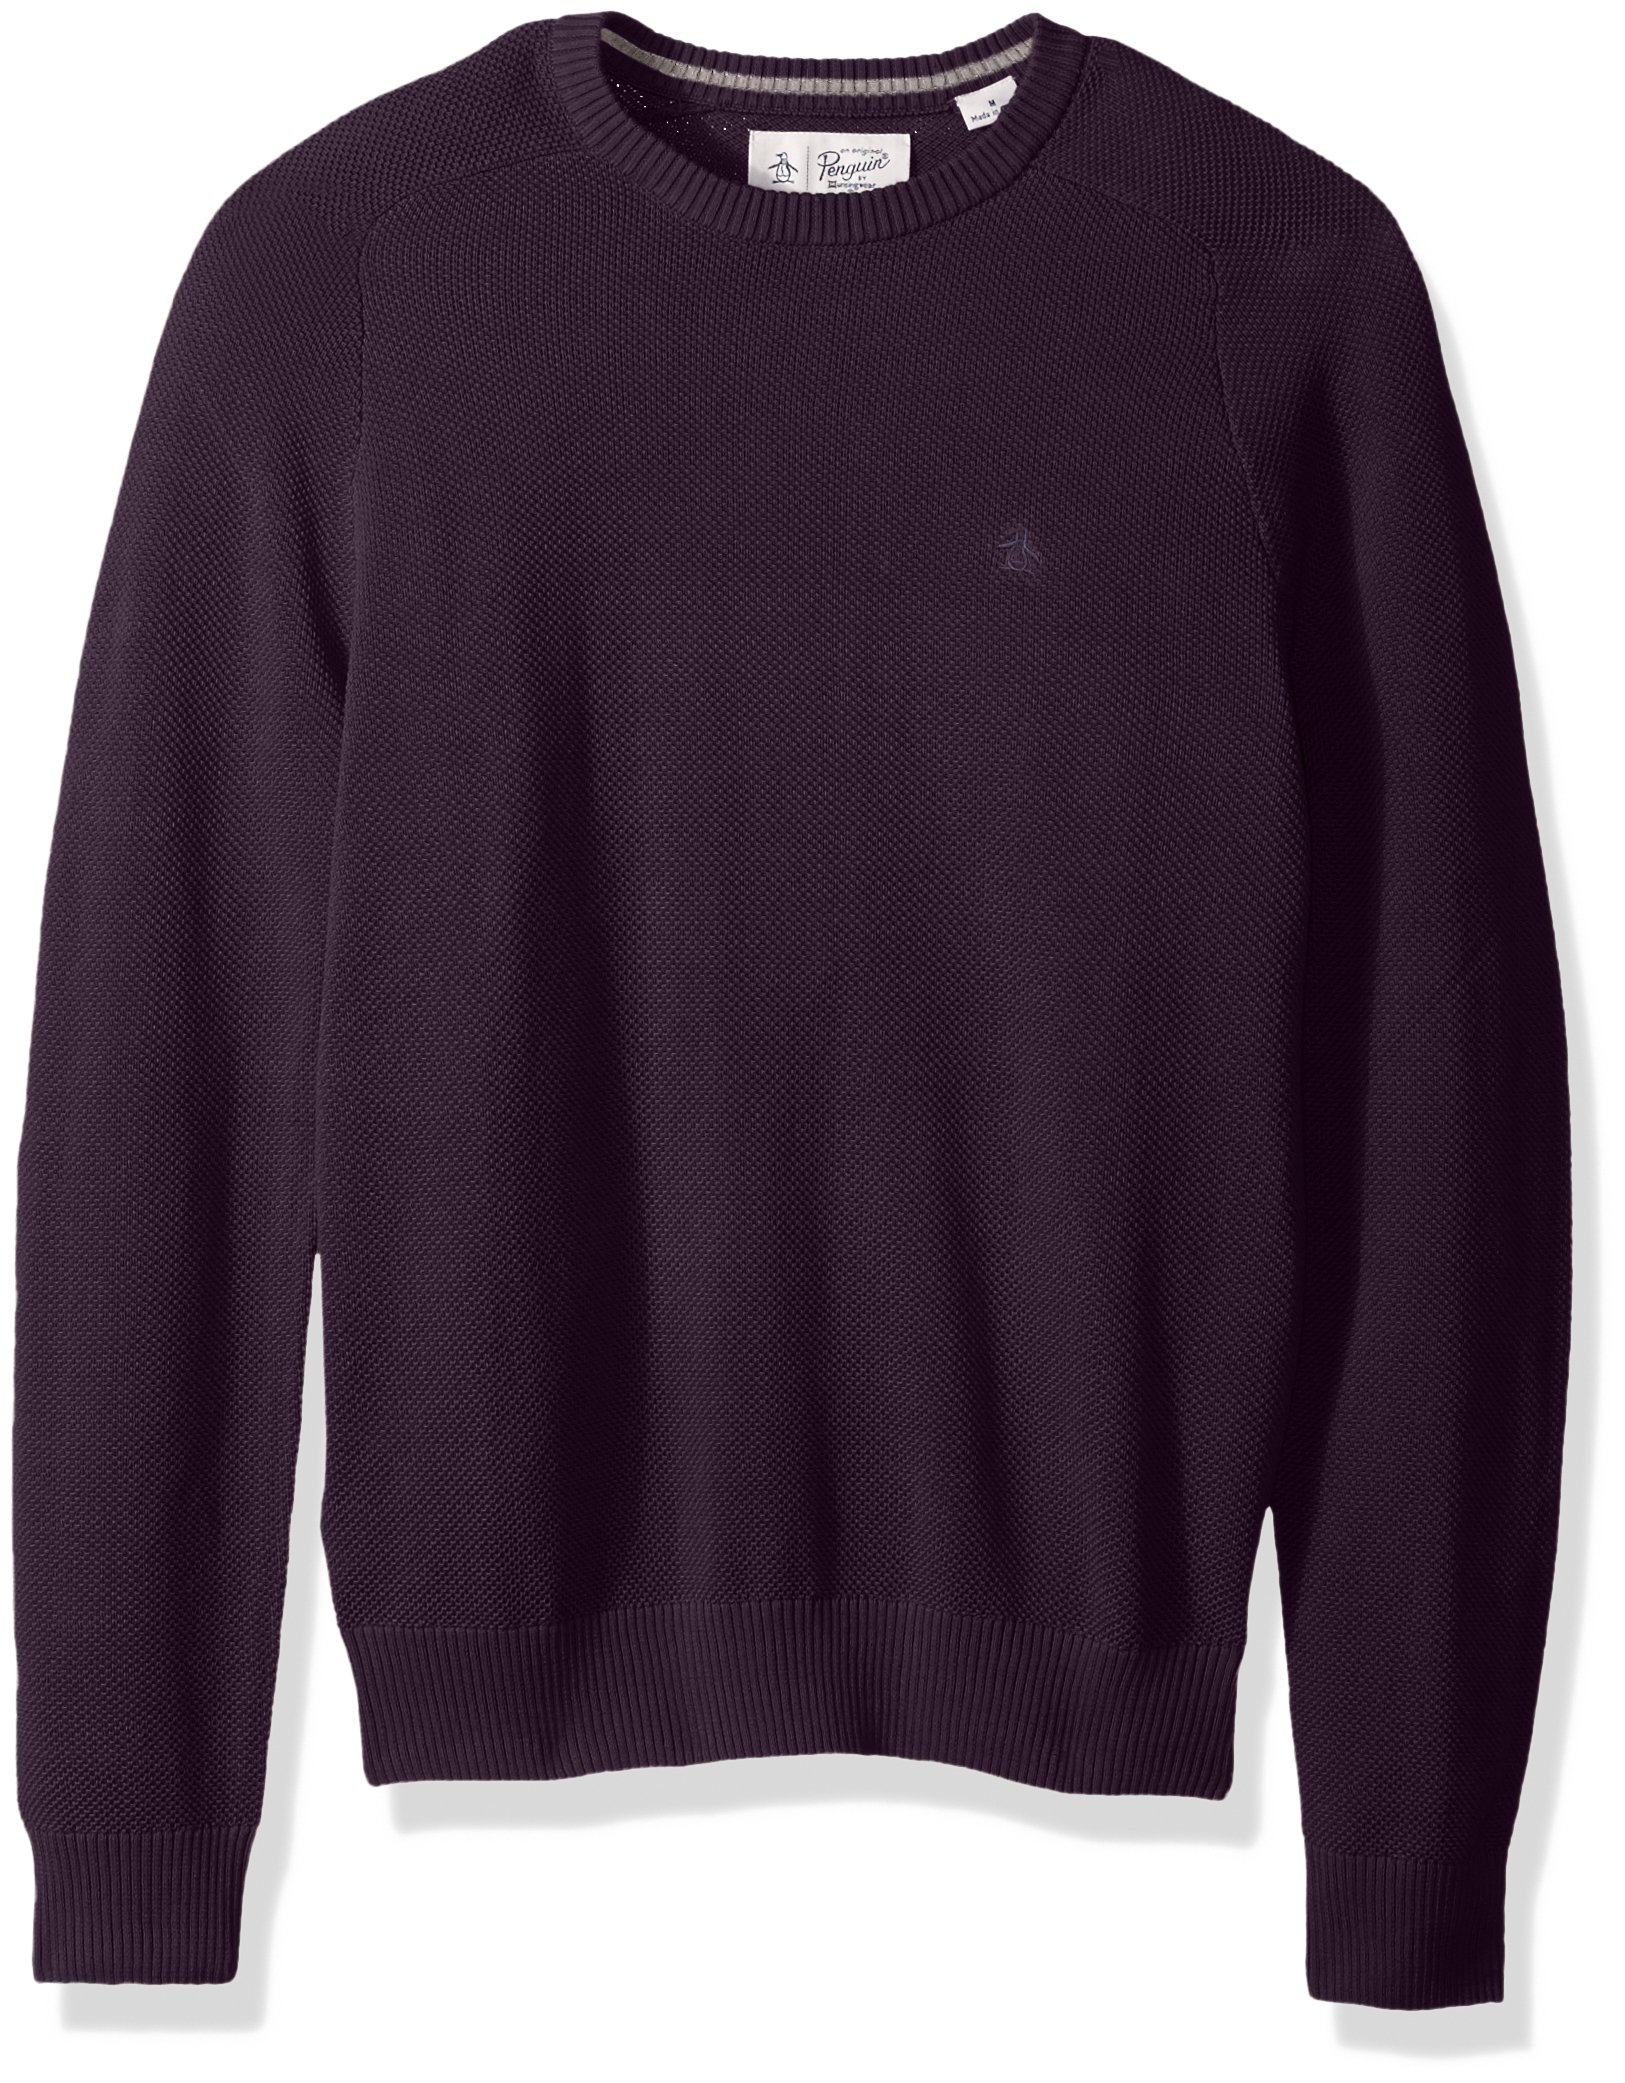 Original Penguin Men's Long Sleeve Honeycomb Pique Sweater, Nightshade, Medium